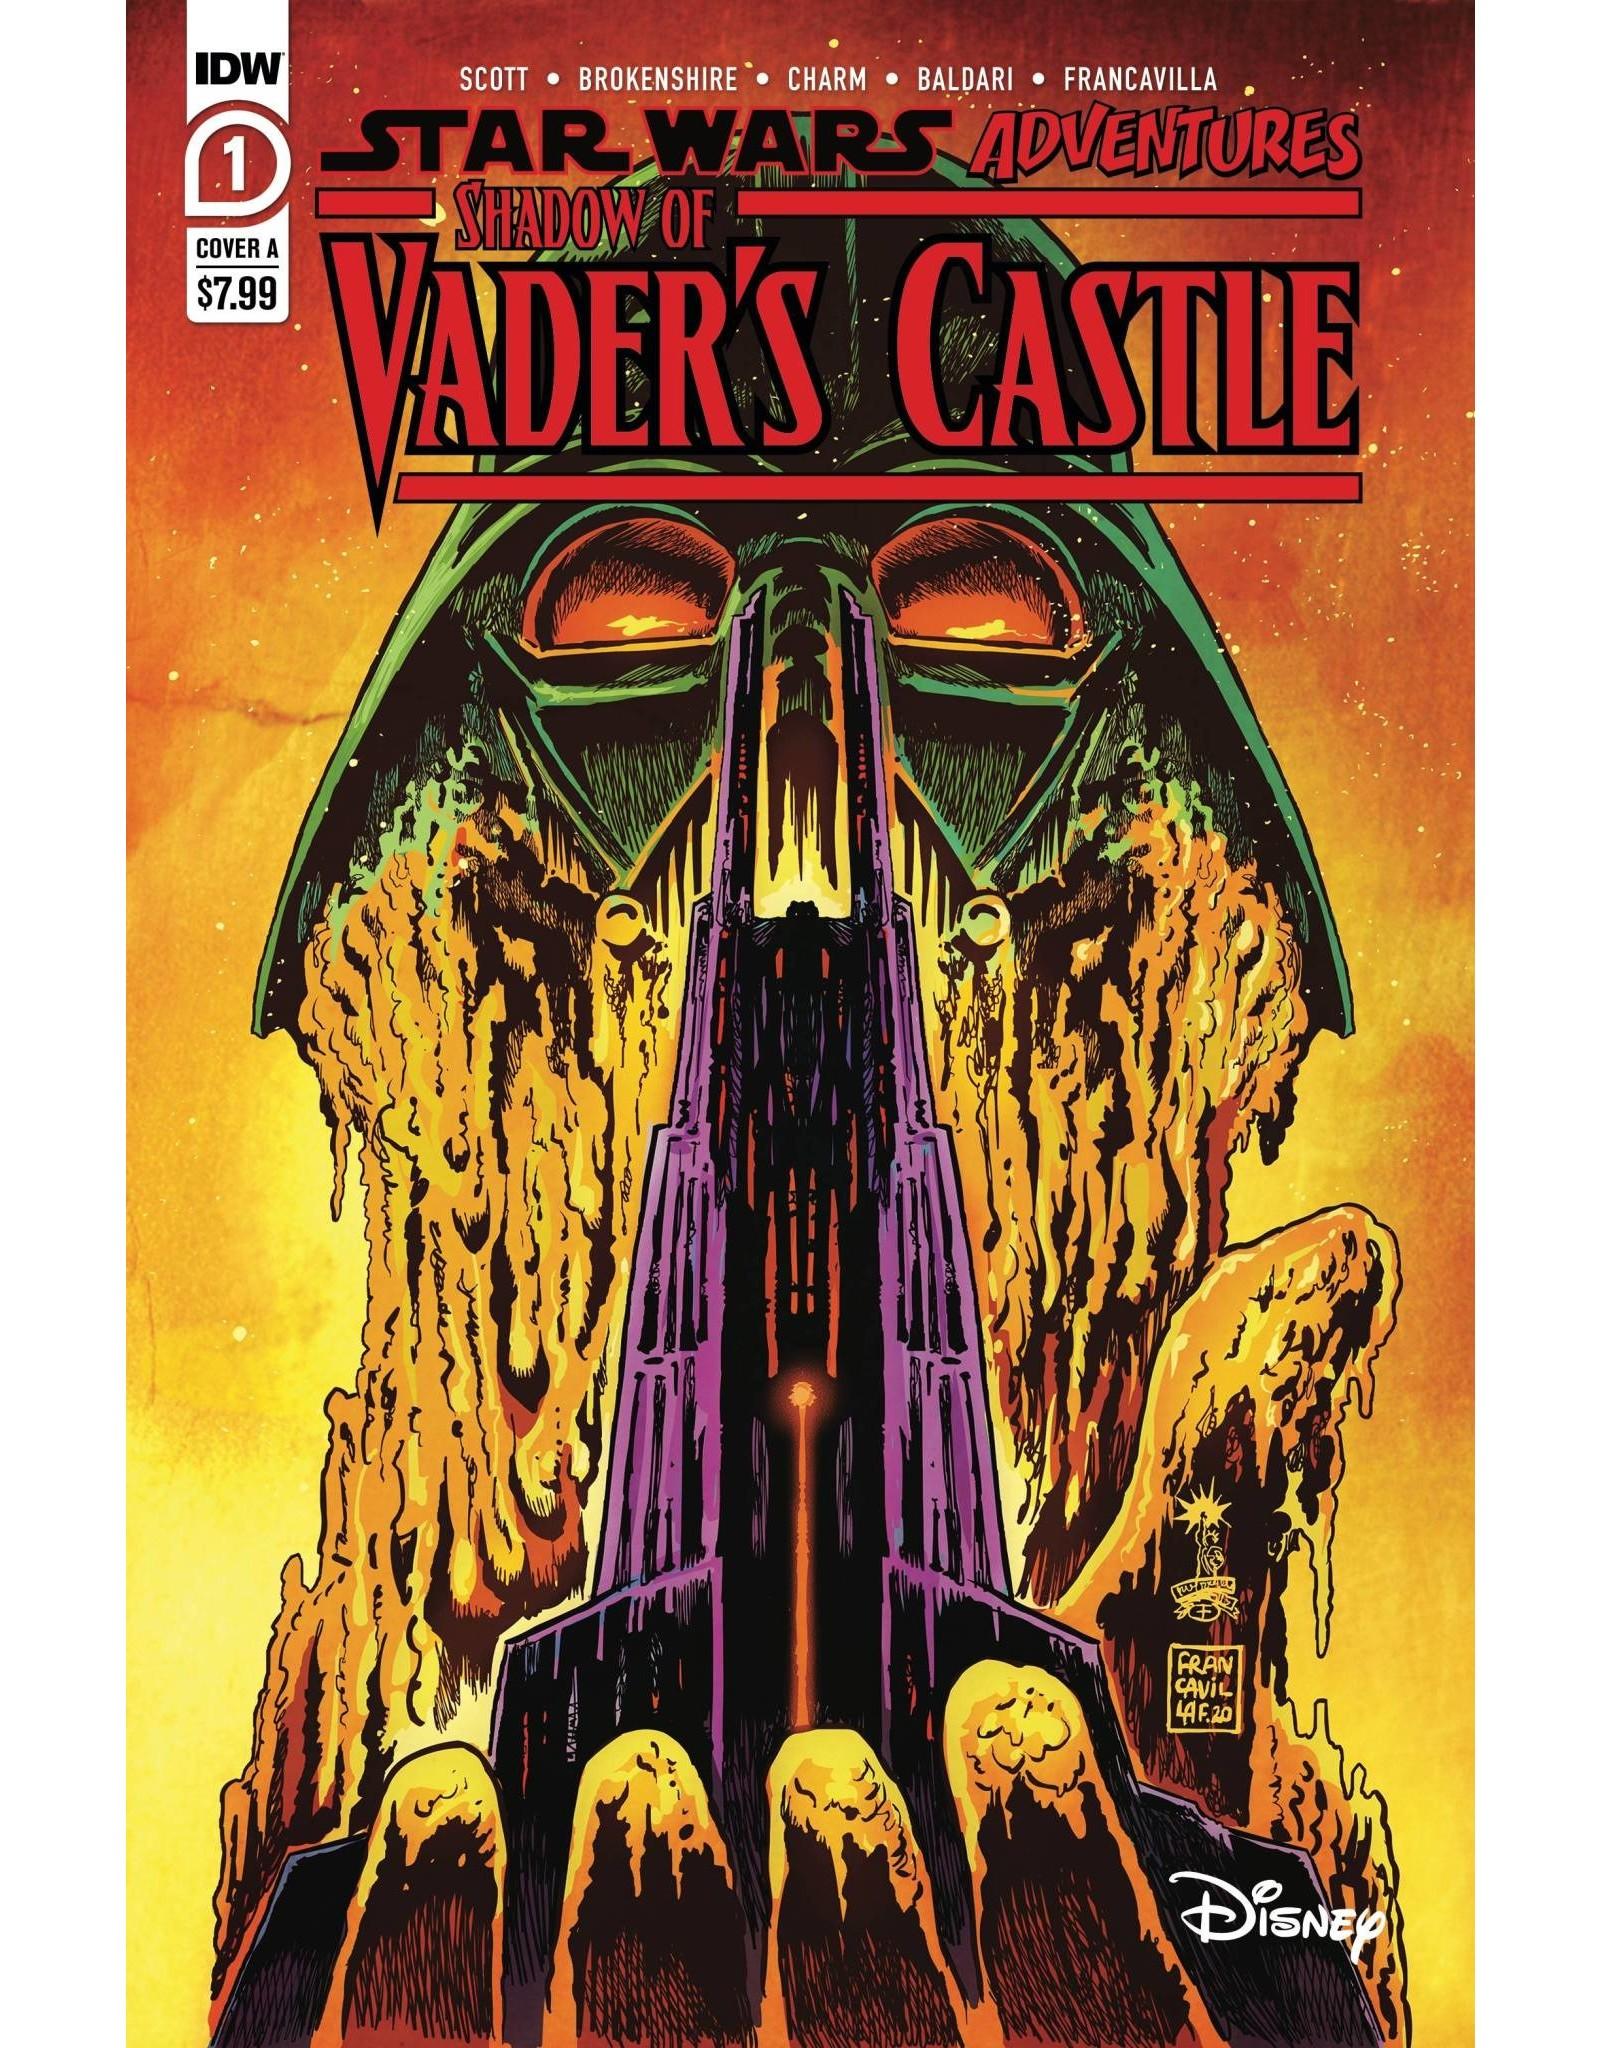 IDW PUBLISHING STAR WARS ADV SHADOW OF VADERS CASTLE CVR A FRANCAVILLA (C: